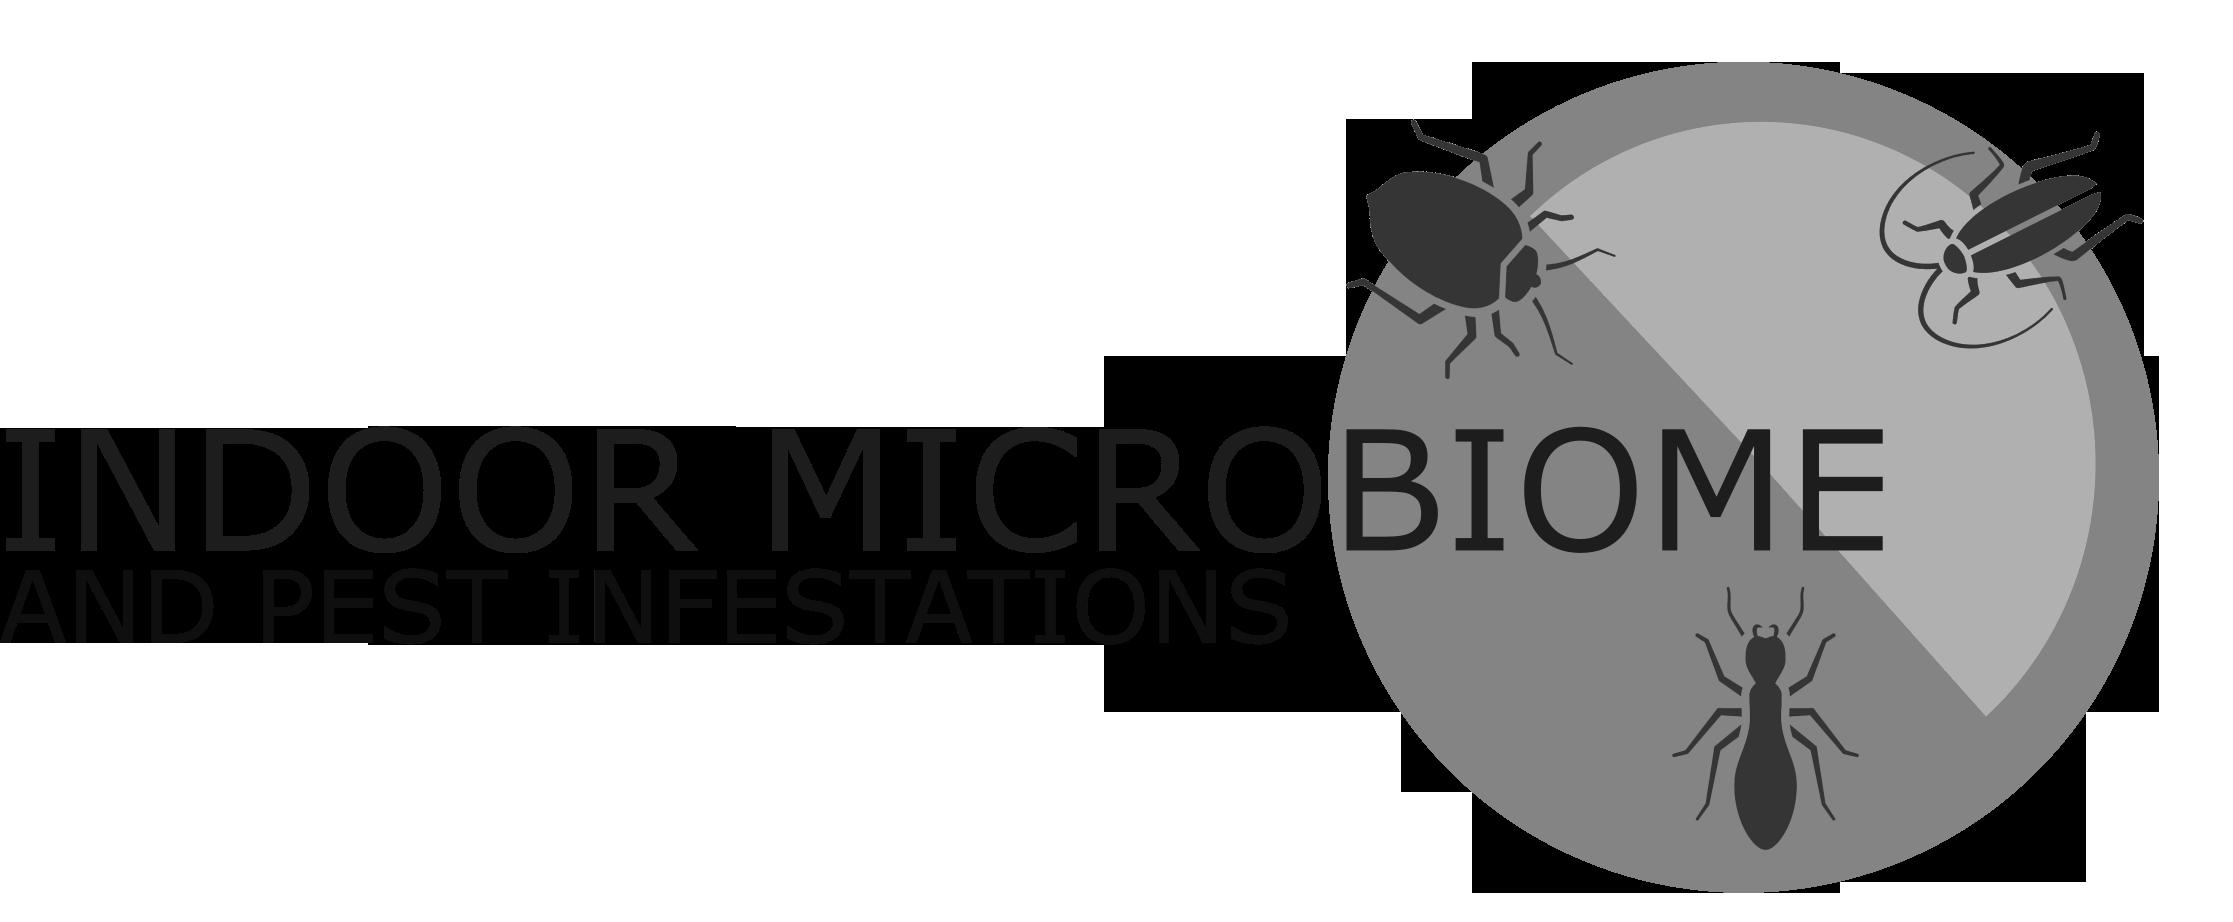 Indoor_microbiome